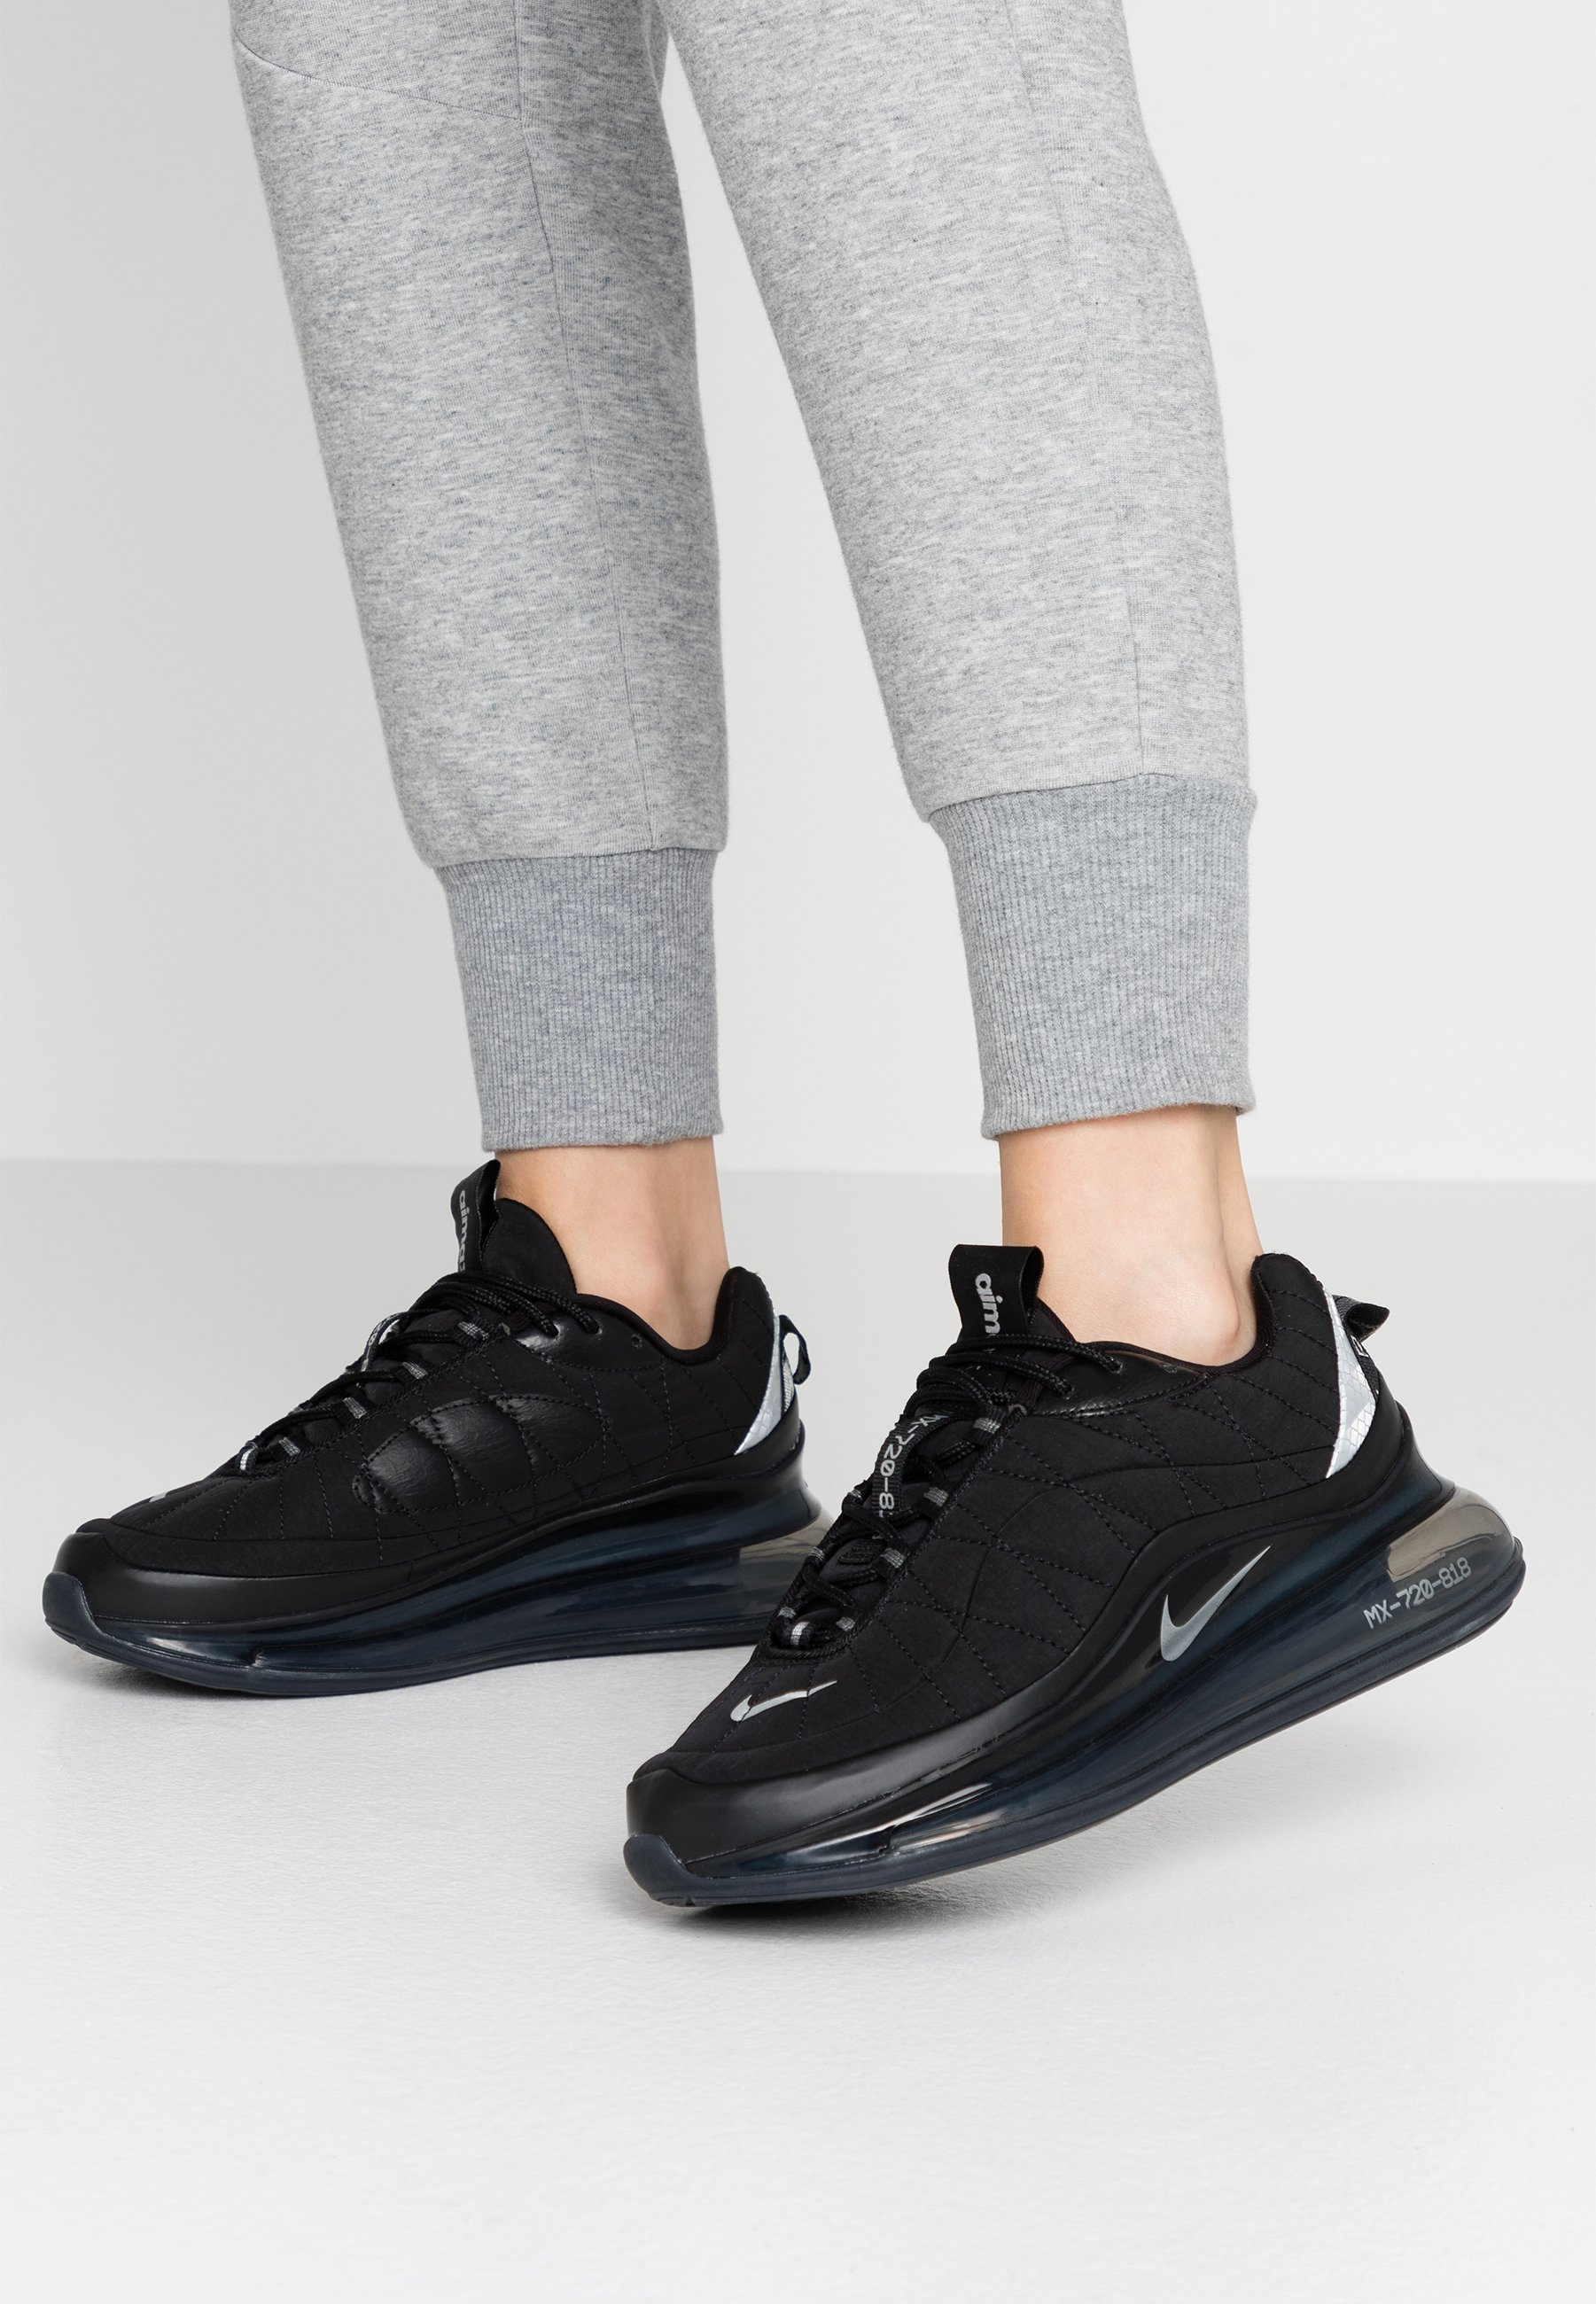 MX-720-818 - Baskets basses - black/metallic silver/anthracite